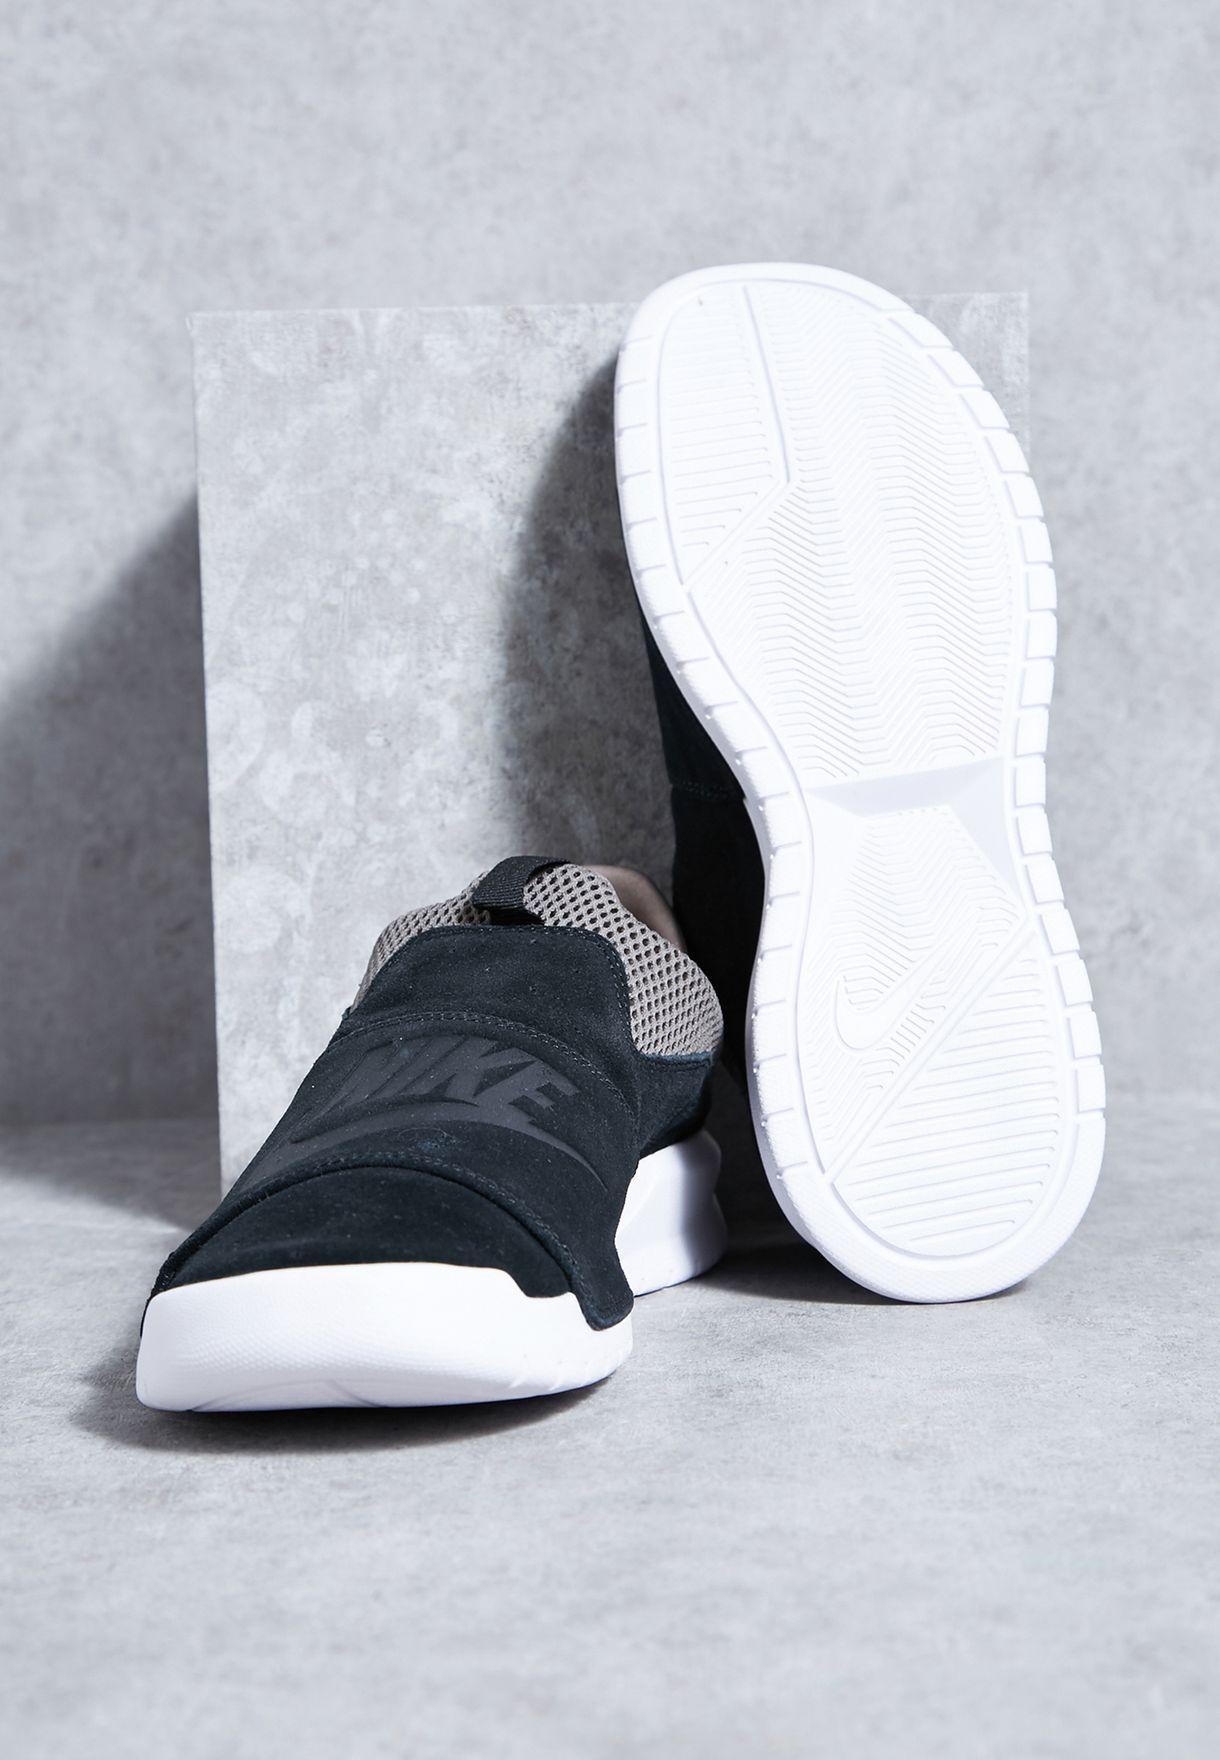 quality design ae70d d65c3 Nike. Benassi Slip